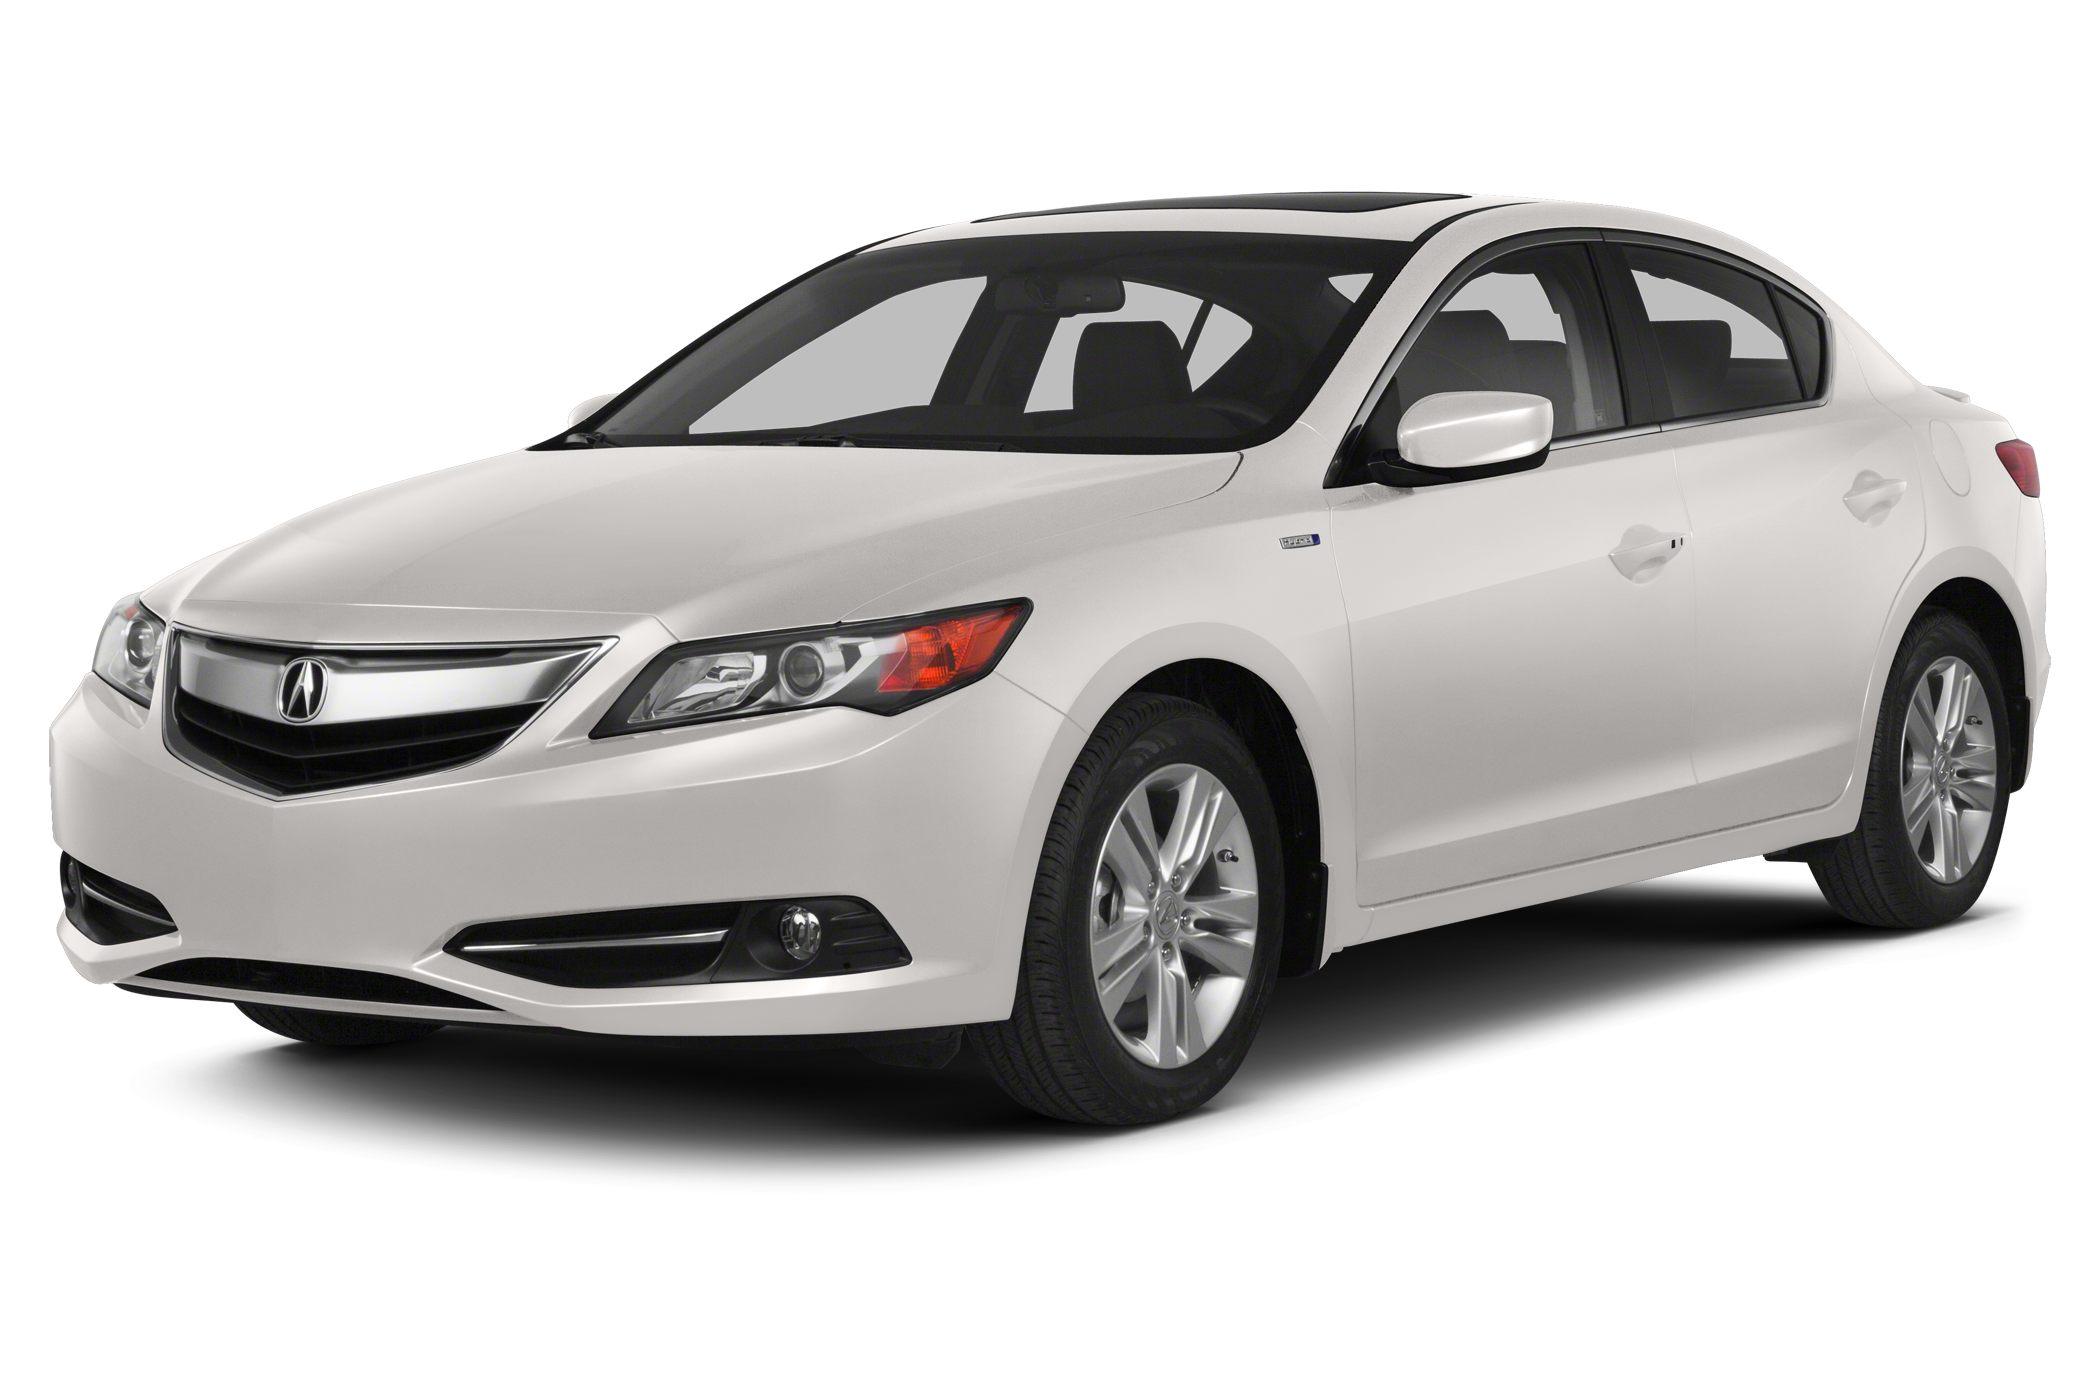 2013 Acura ILX Hybrid Technology Miles 20897Color Gray Stock 8612 VIN 19VDE3F75DE000025